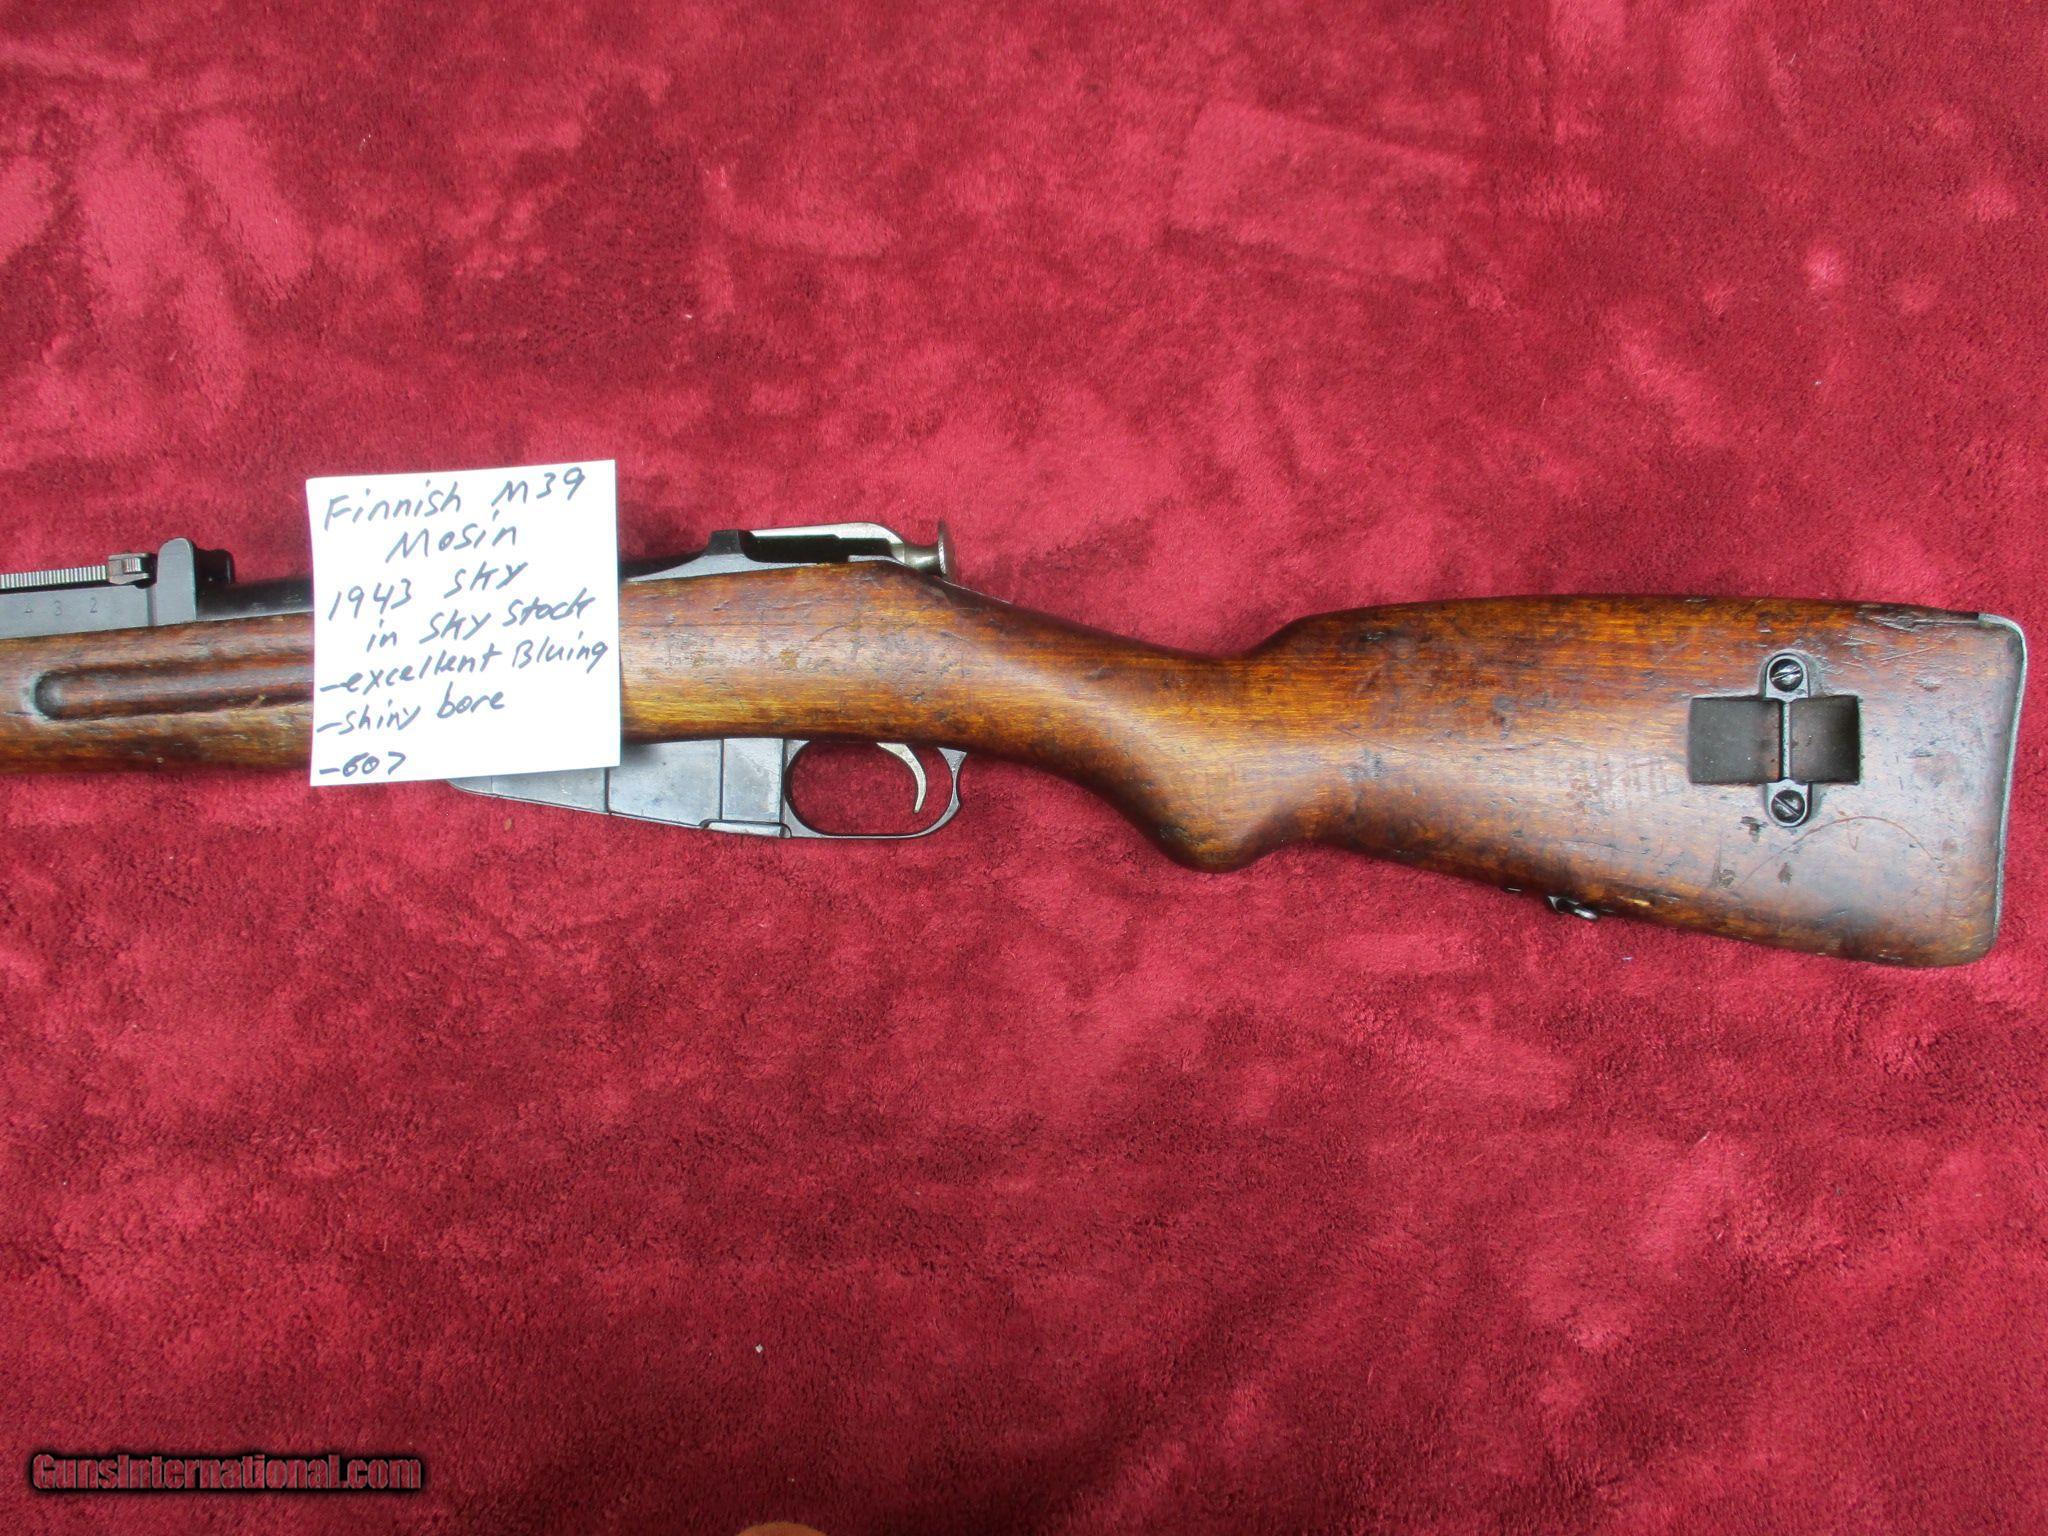 Finnish M39 Mosin Nagant 1943 Sky In Stock Parts Diagram 91 30 2 Of 14